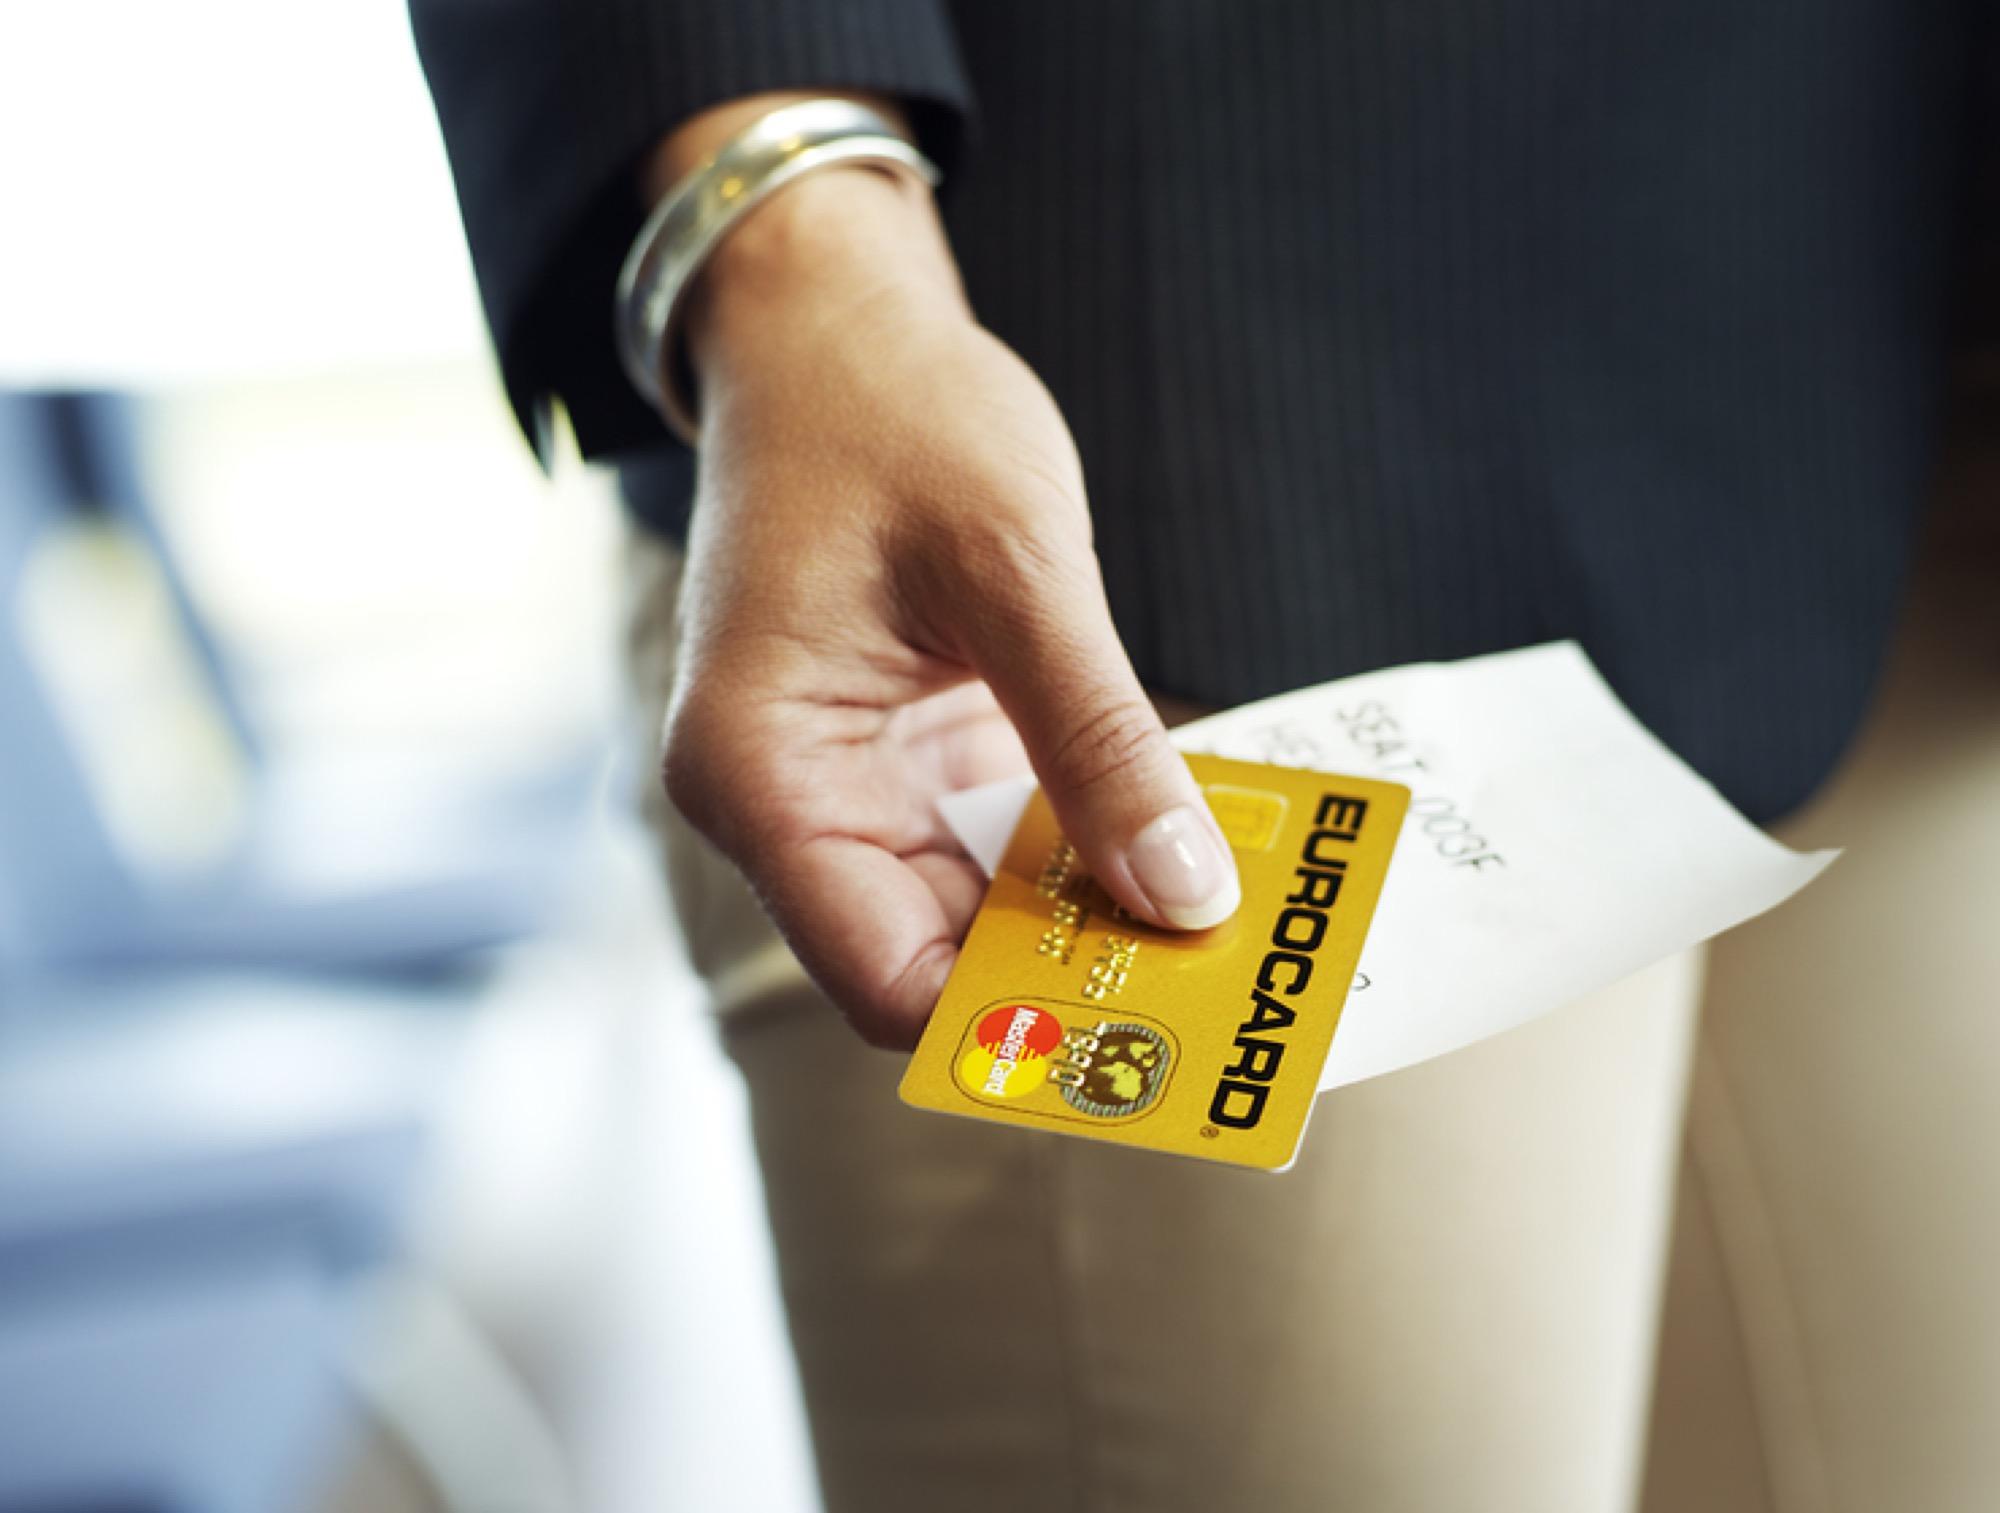 eurocard-09